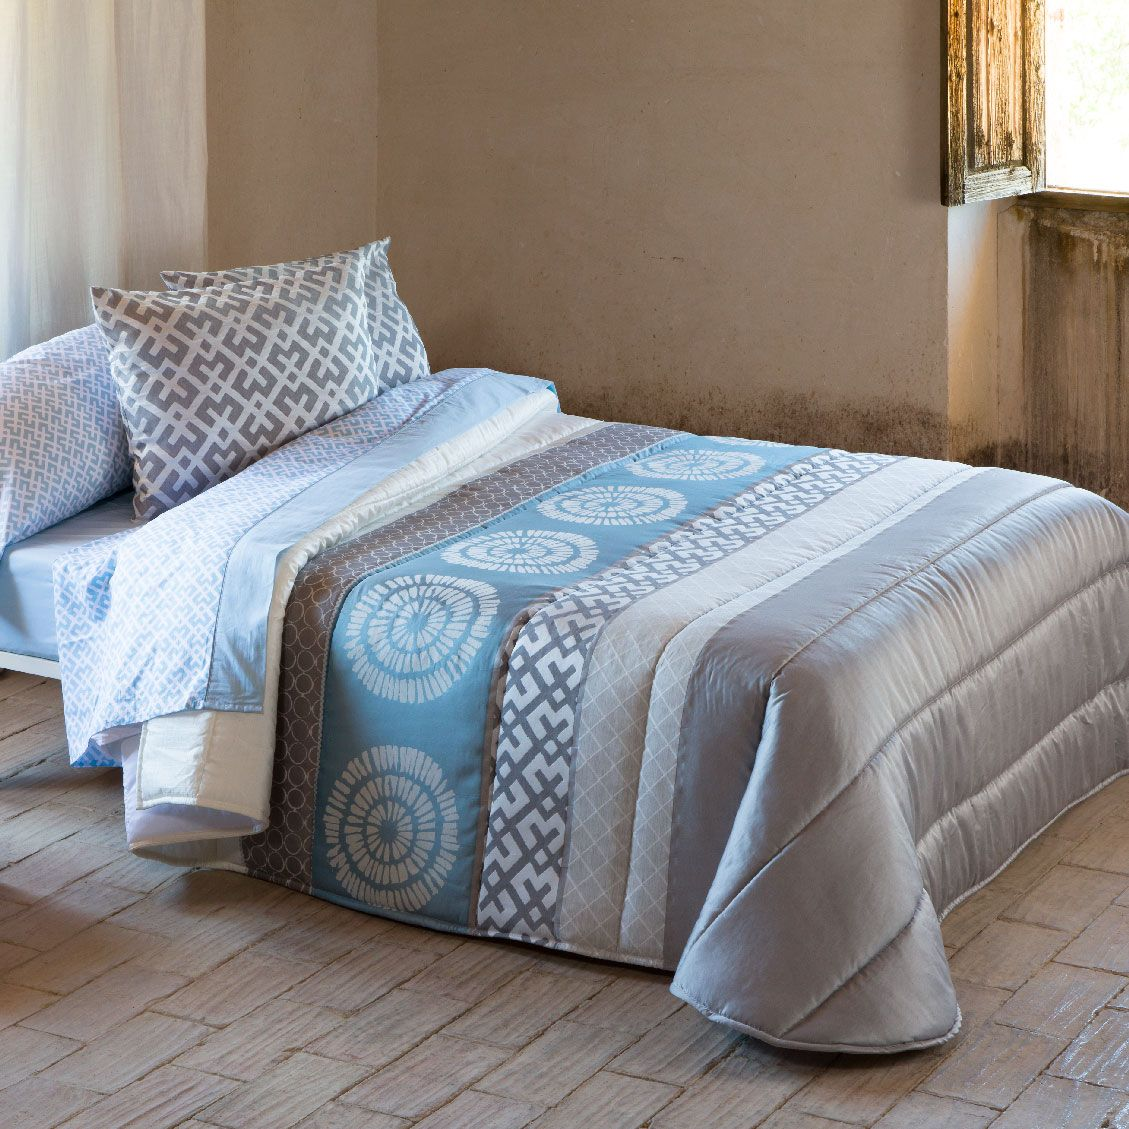 Edredon Comforter Jacquard Lazio Textil Hogar Ropa De Hogar